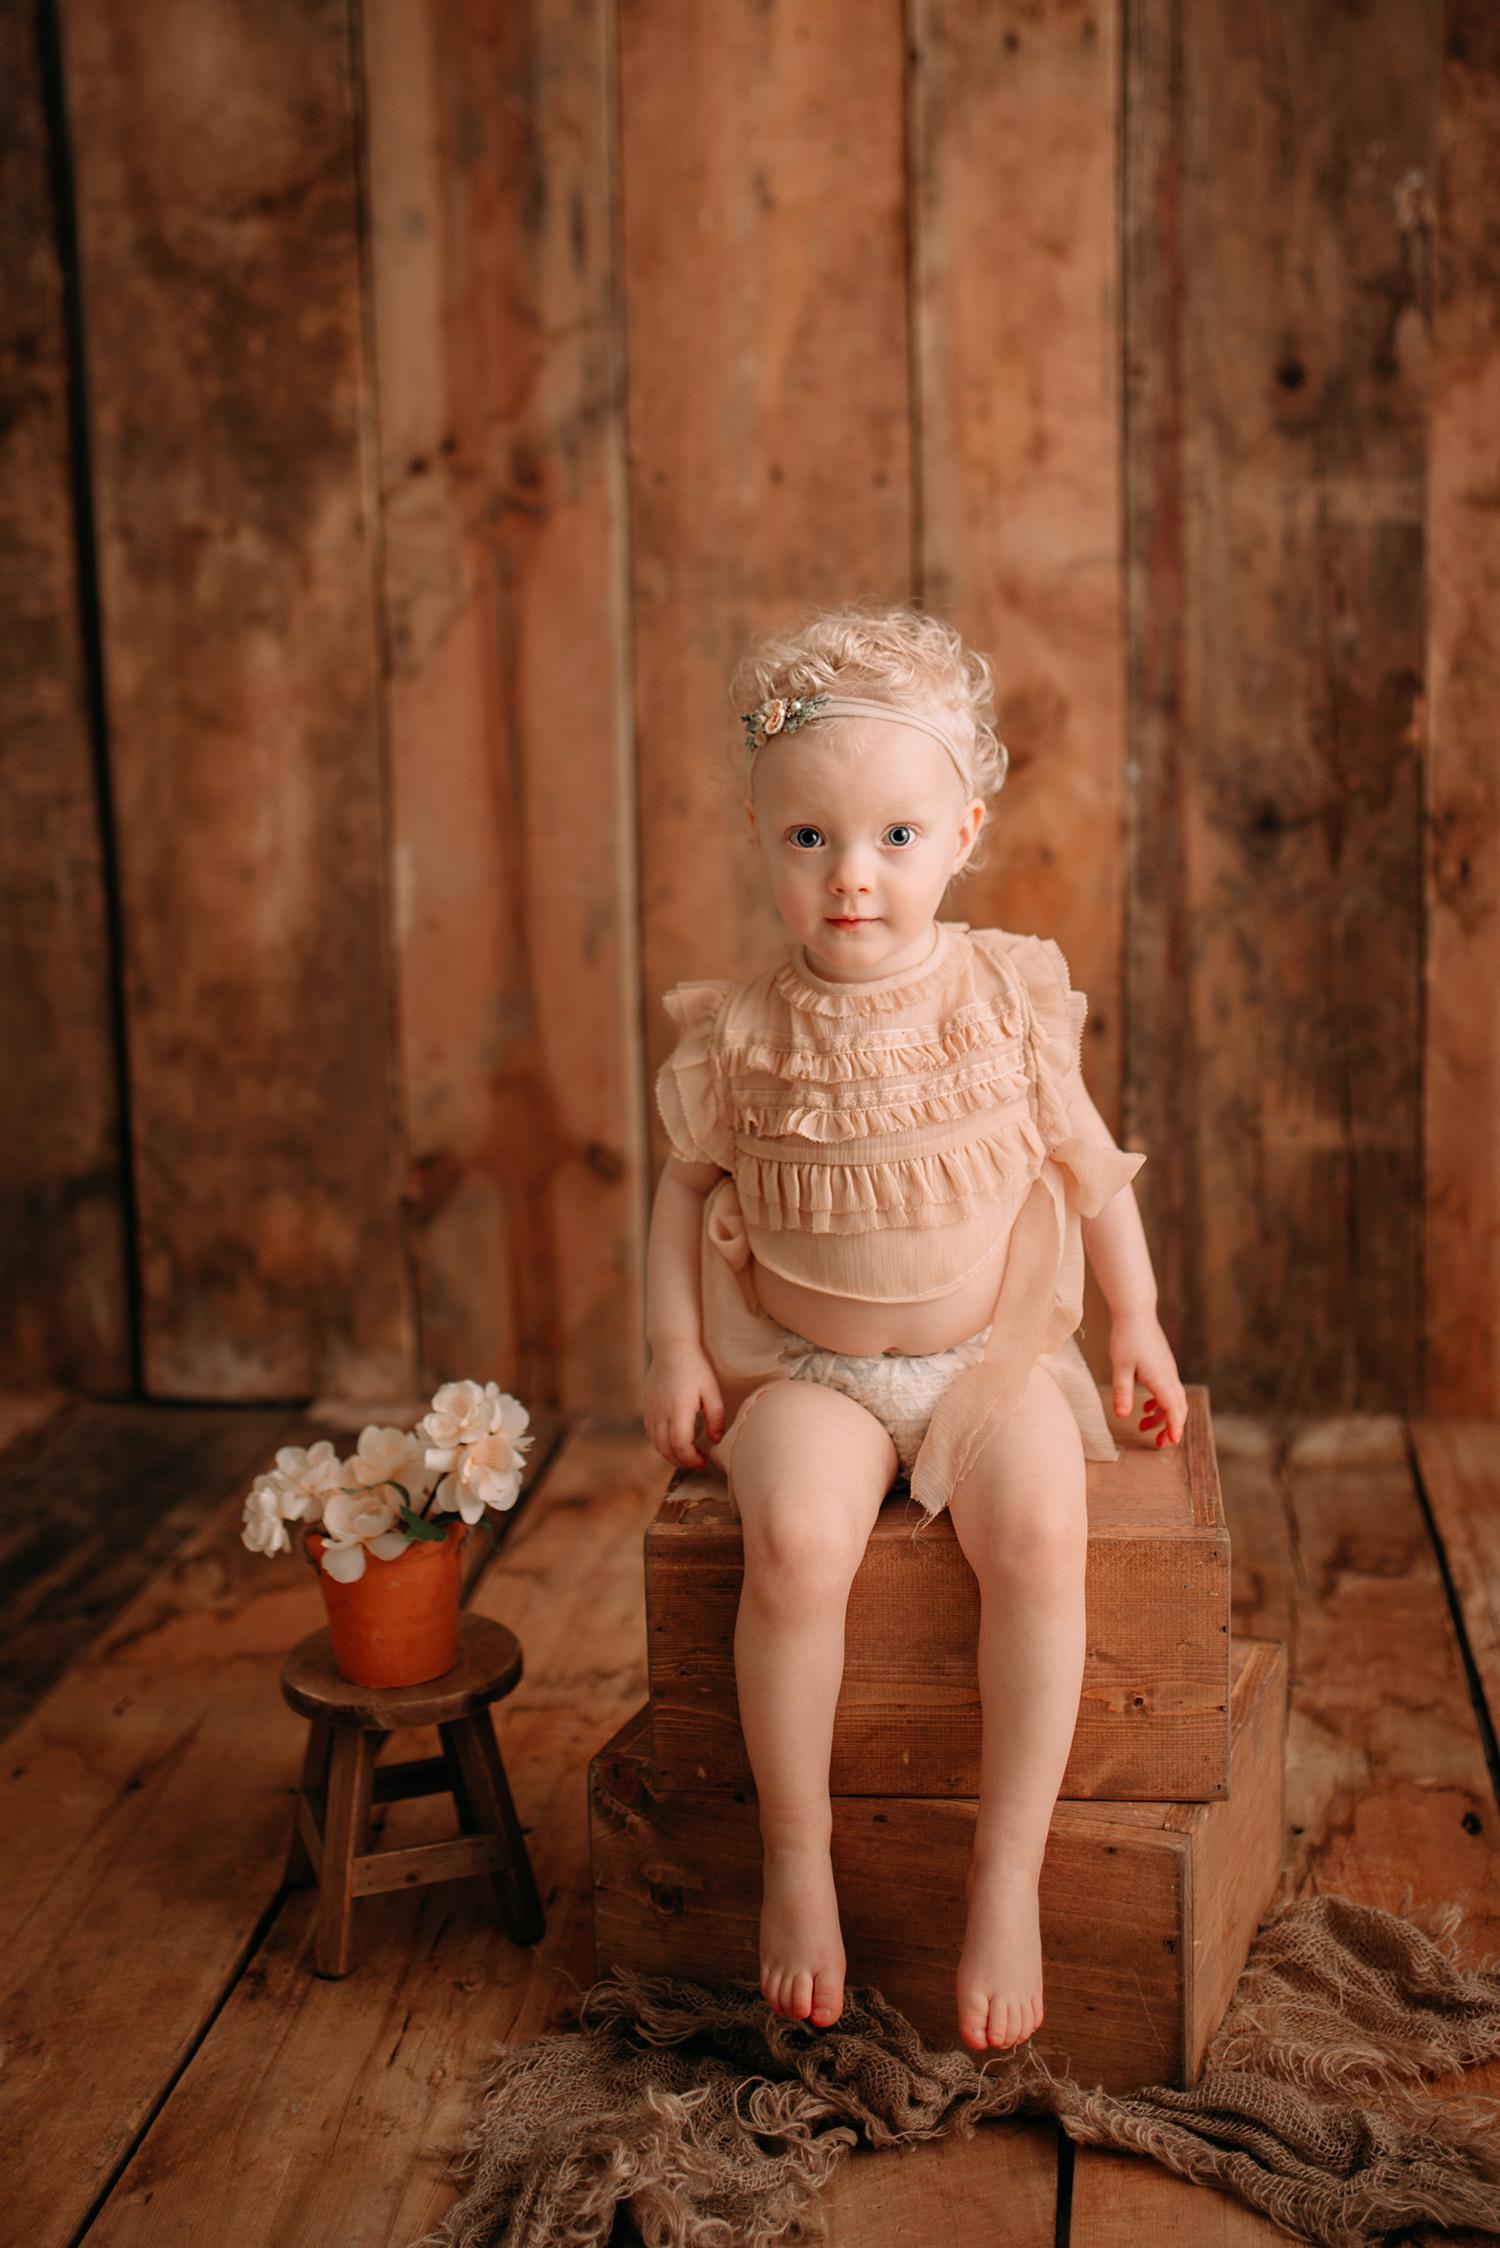 st_paul_baby_photographer.jpg